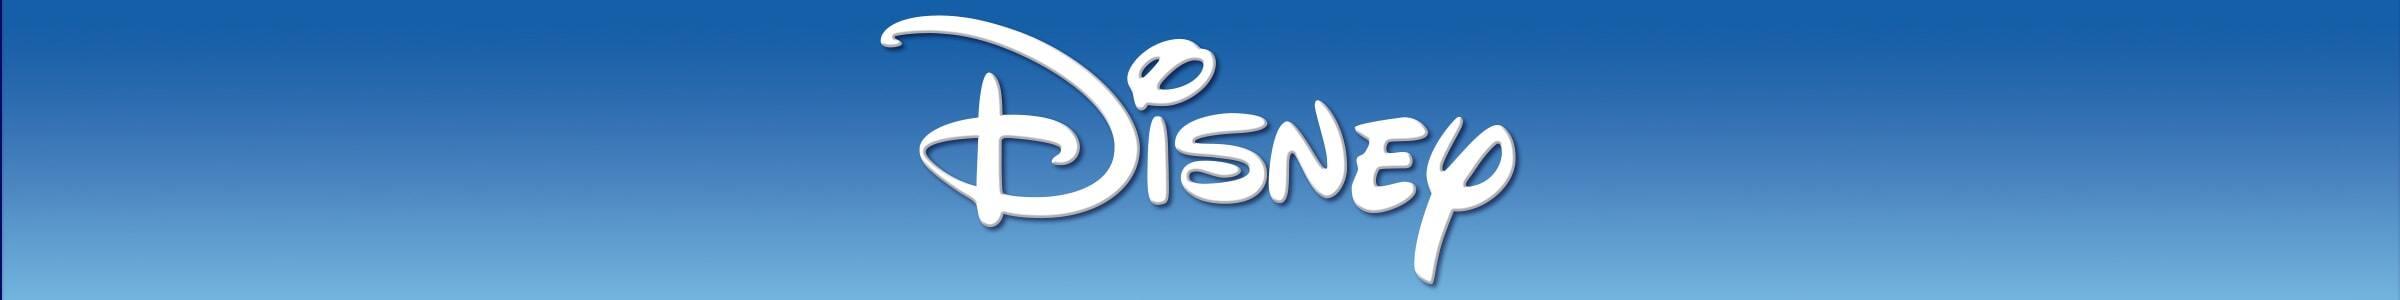 Category_Teaser_Header_Disney_1_2400x300